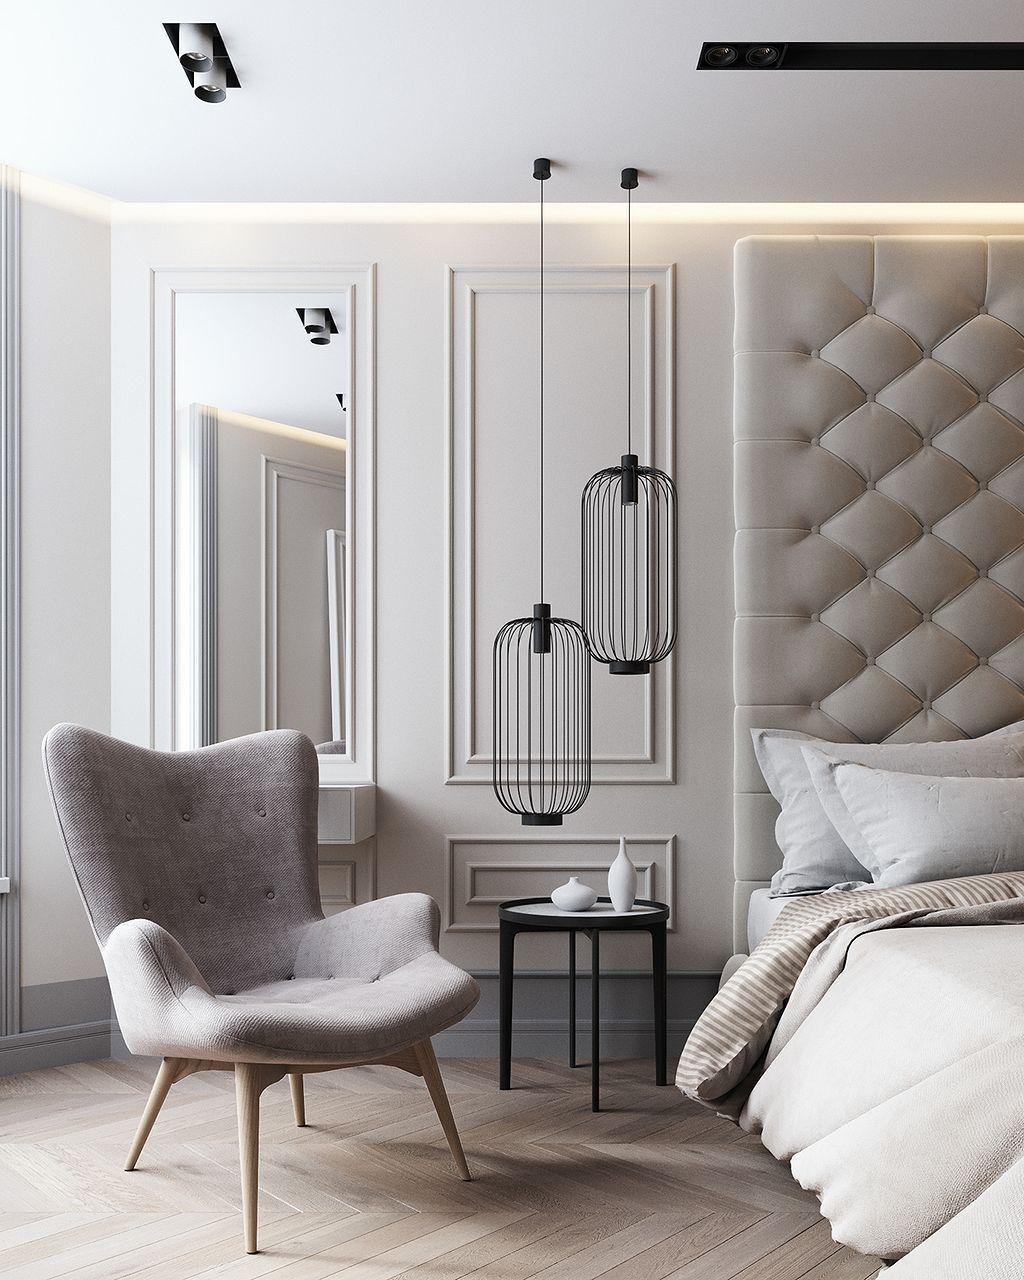 Stunning 34 Elegant Bedroom Decoration Ideas Https Kidmagz Com 34 Elegant Bedroom Decorat Luxurious Bedrooms Modern Bedroom Furniture Interior Design Bedroom